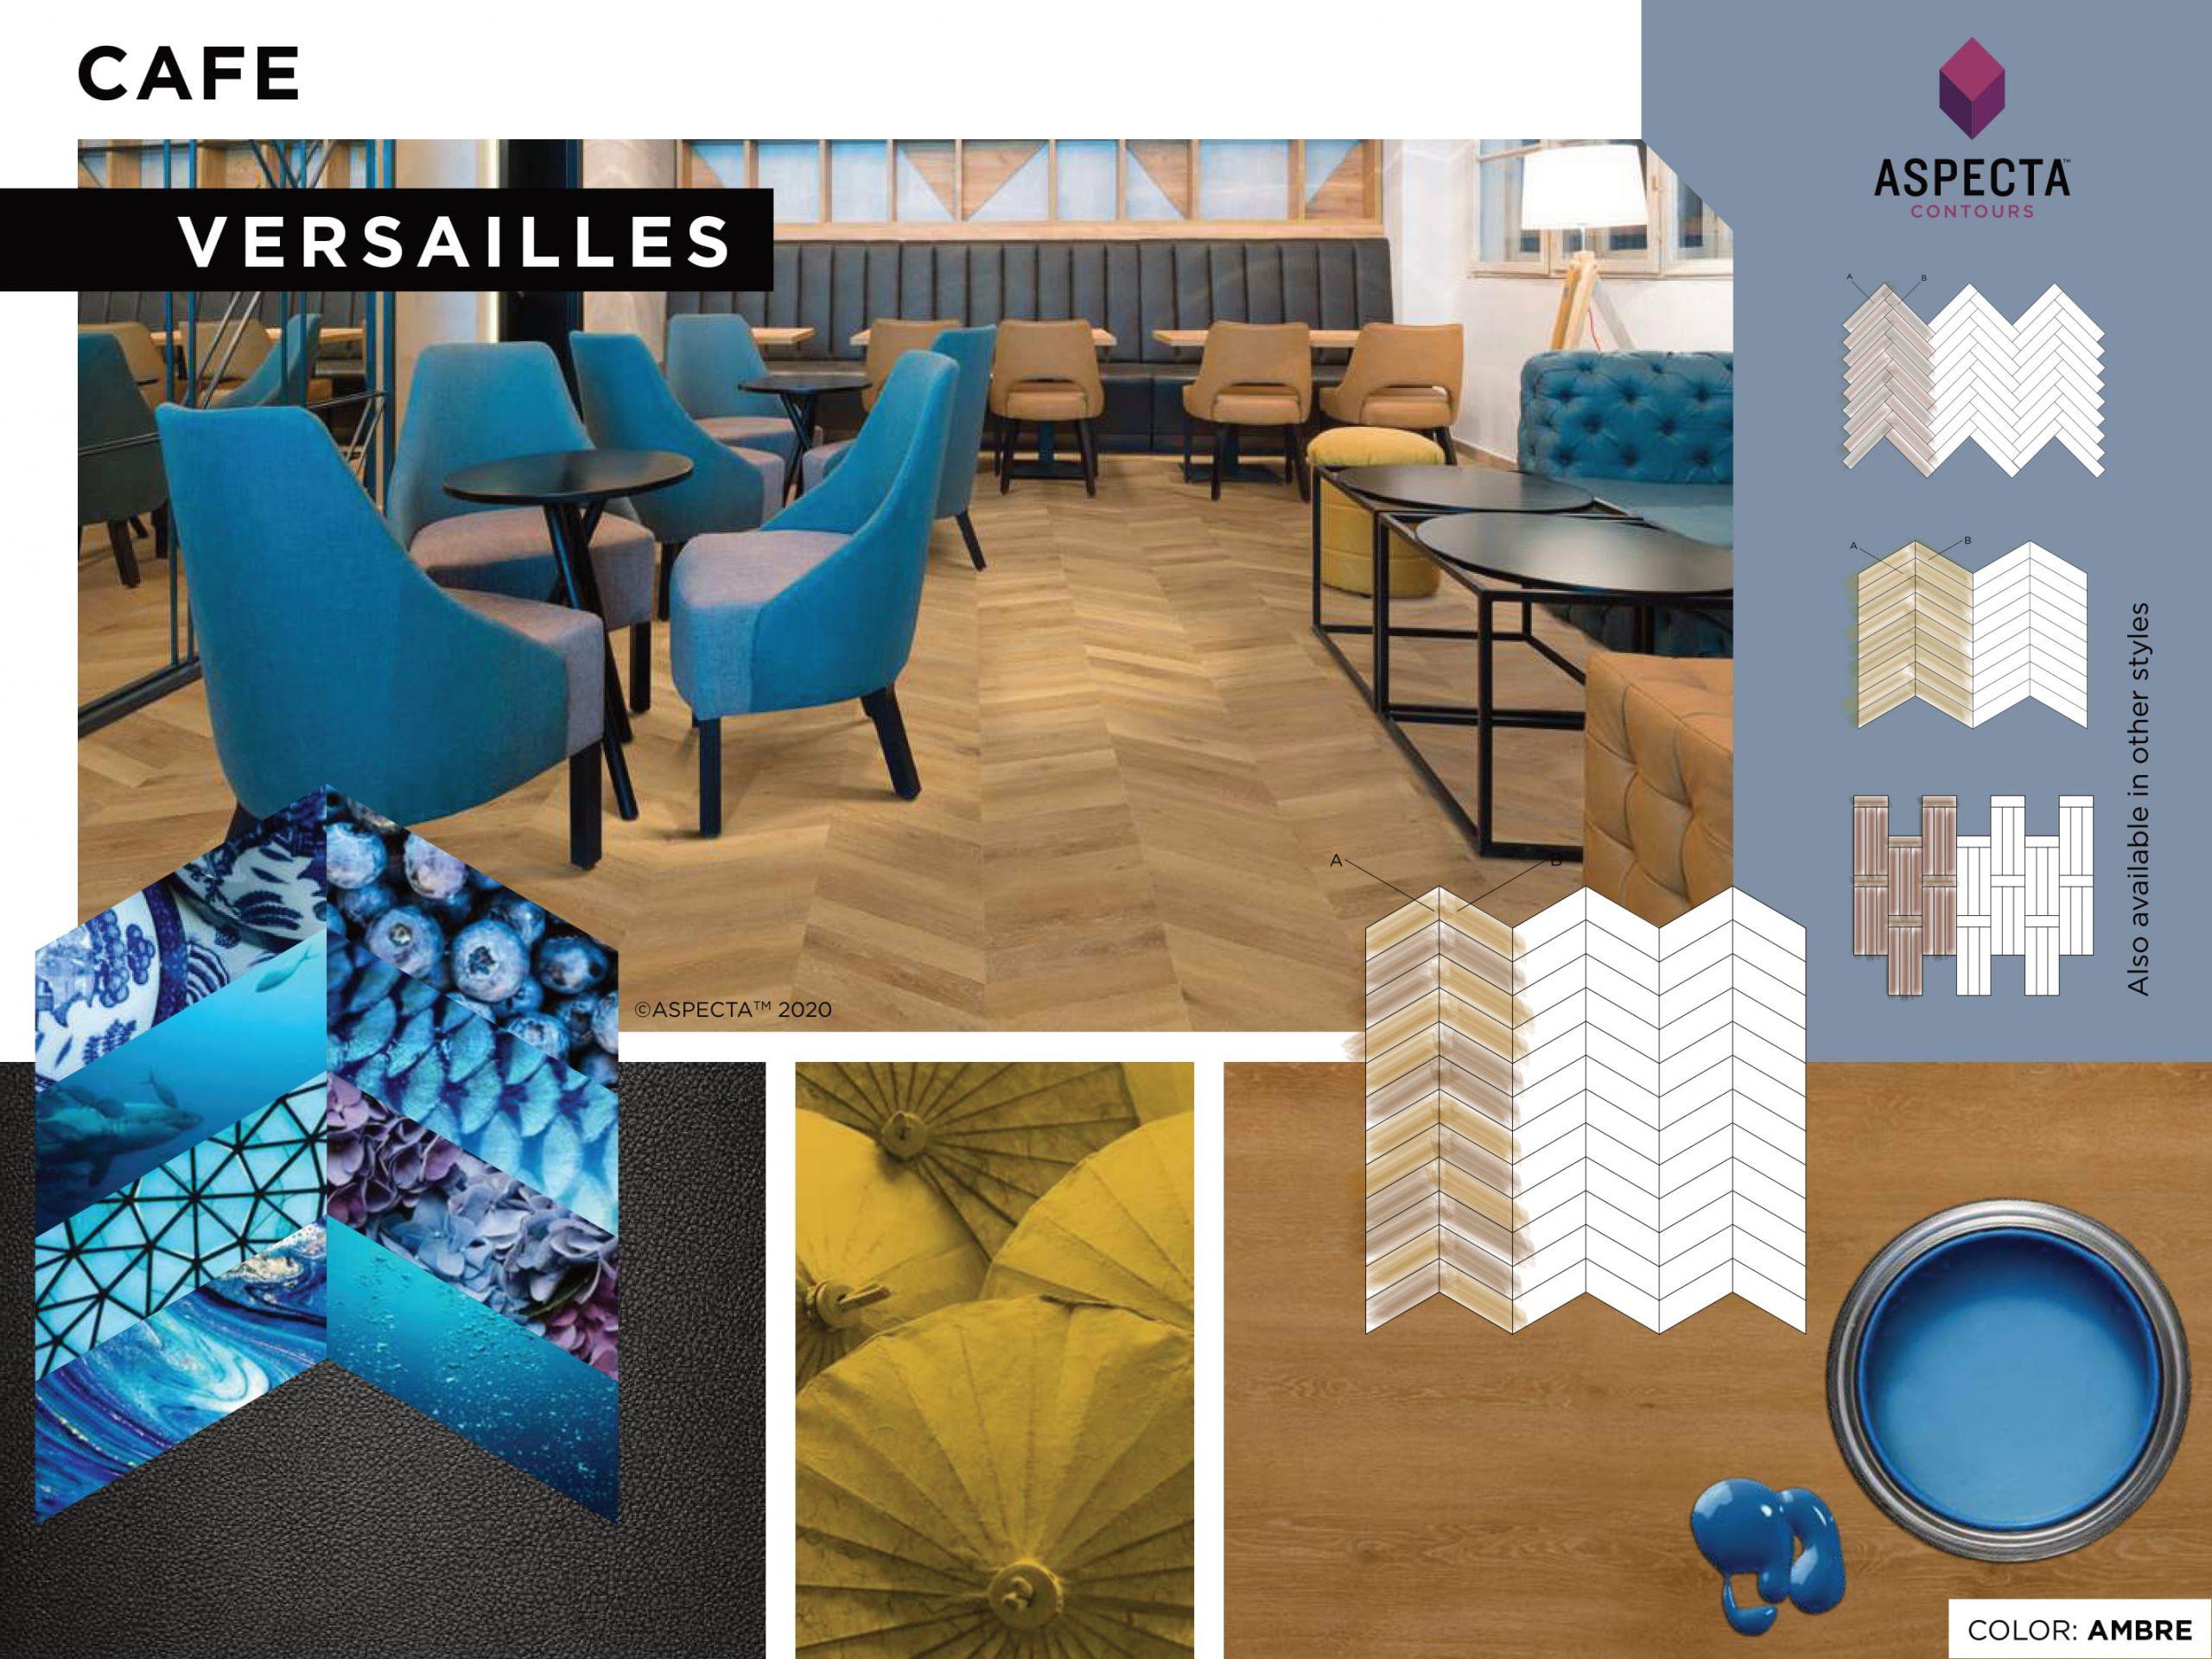 02_ASP_Contours_Moodboard_Versailles_Cafe_web_04_2020-1